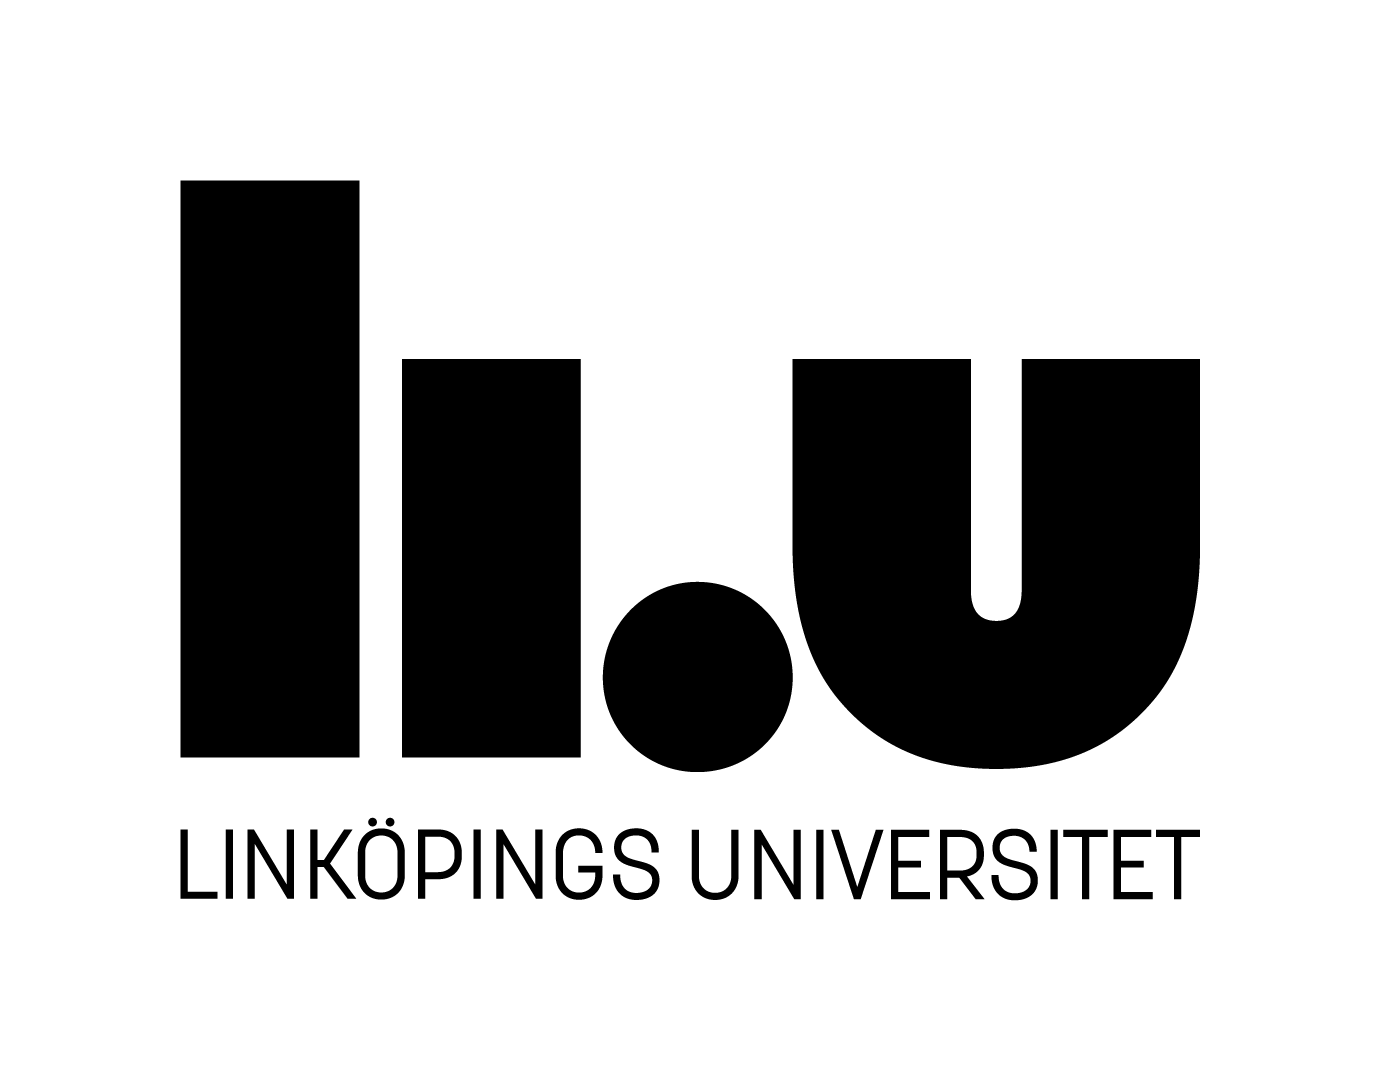 LiU_sekundar_1_svart